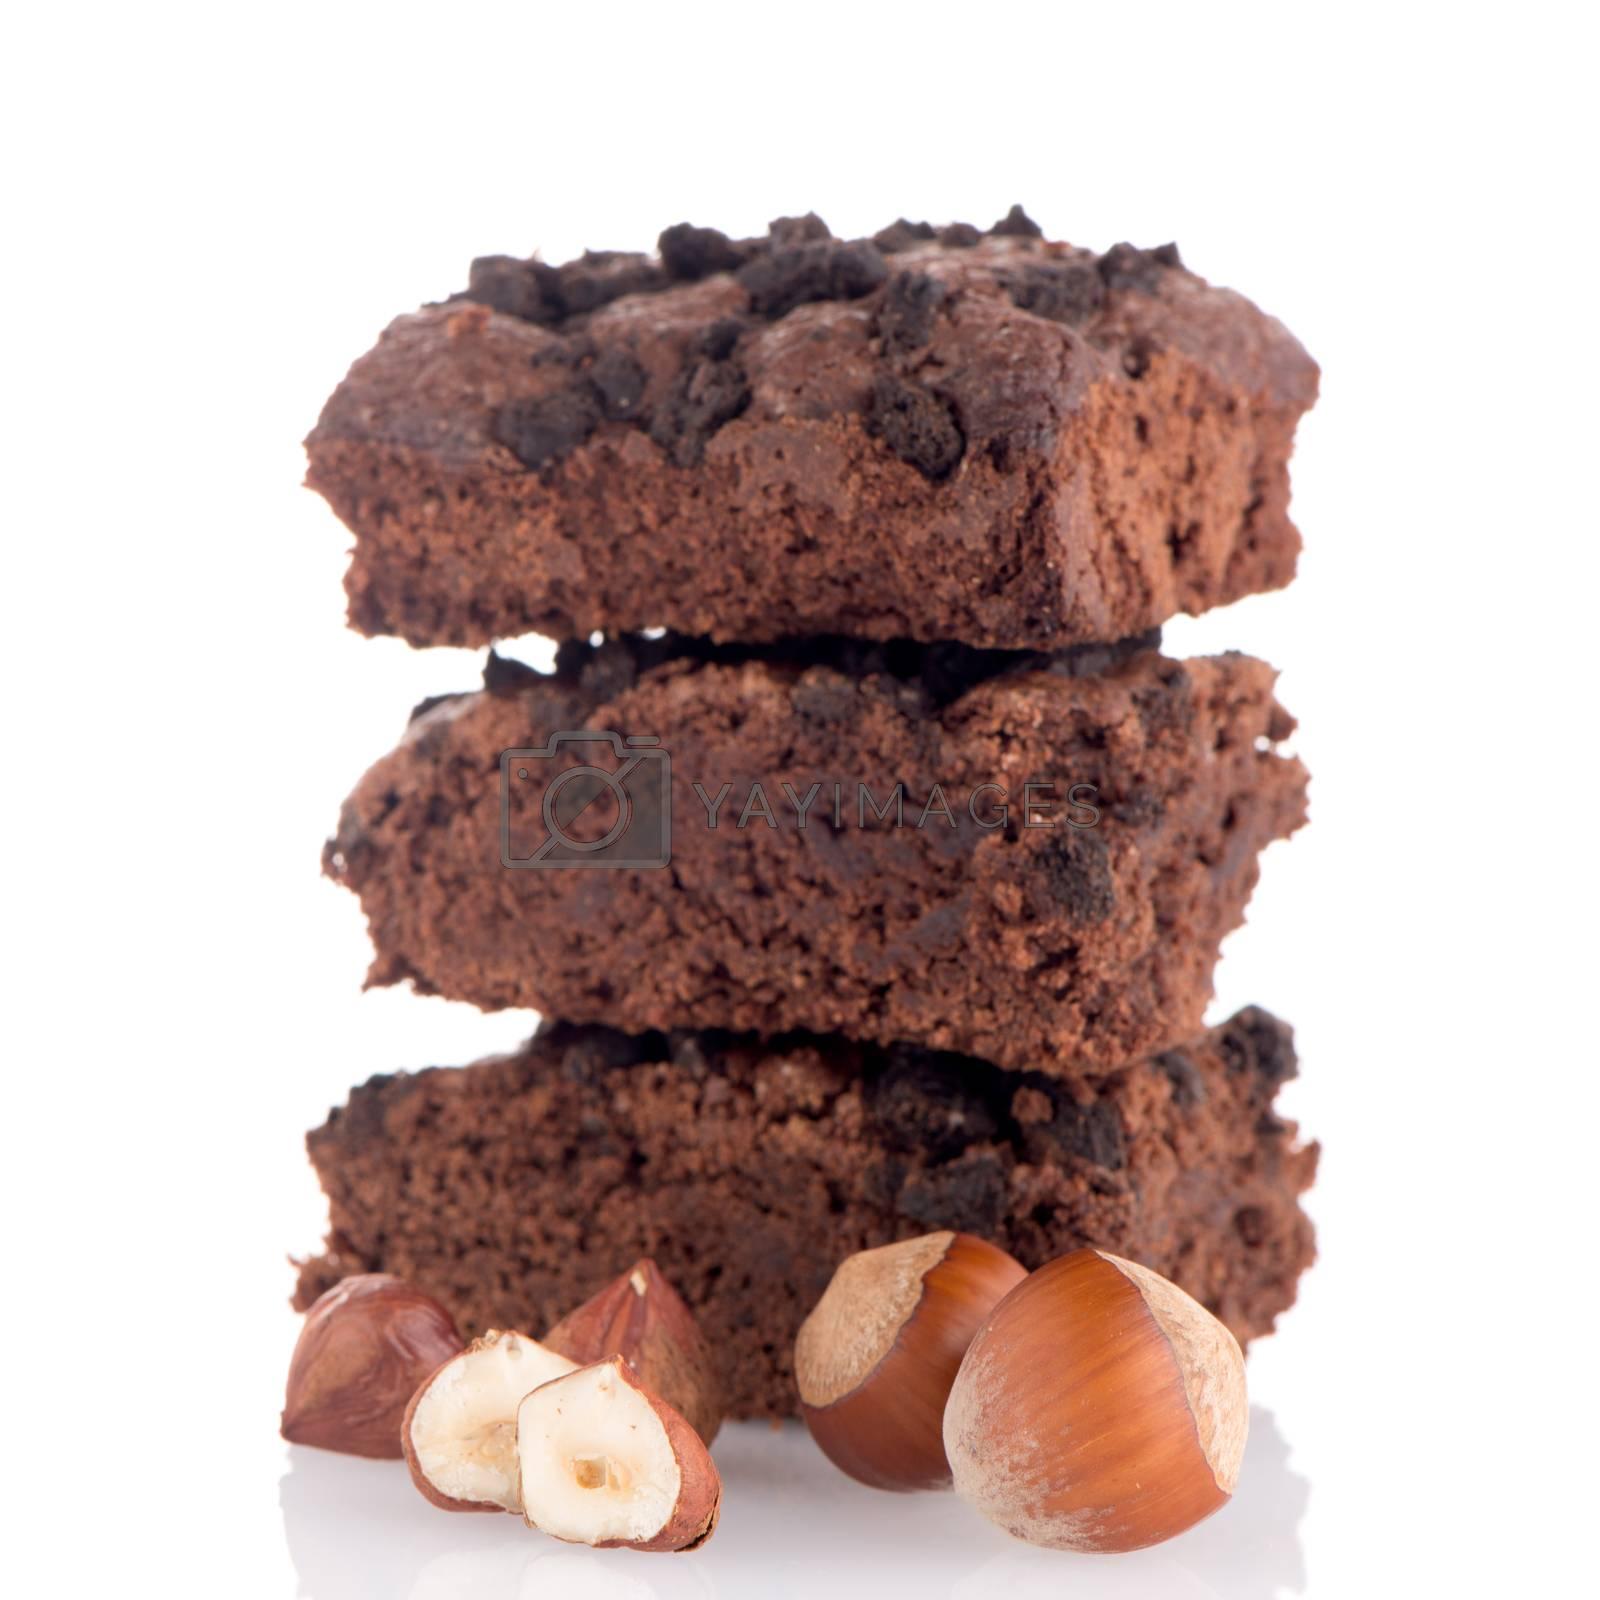 Chocolate brownies dessert on white background